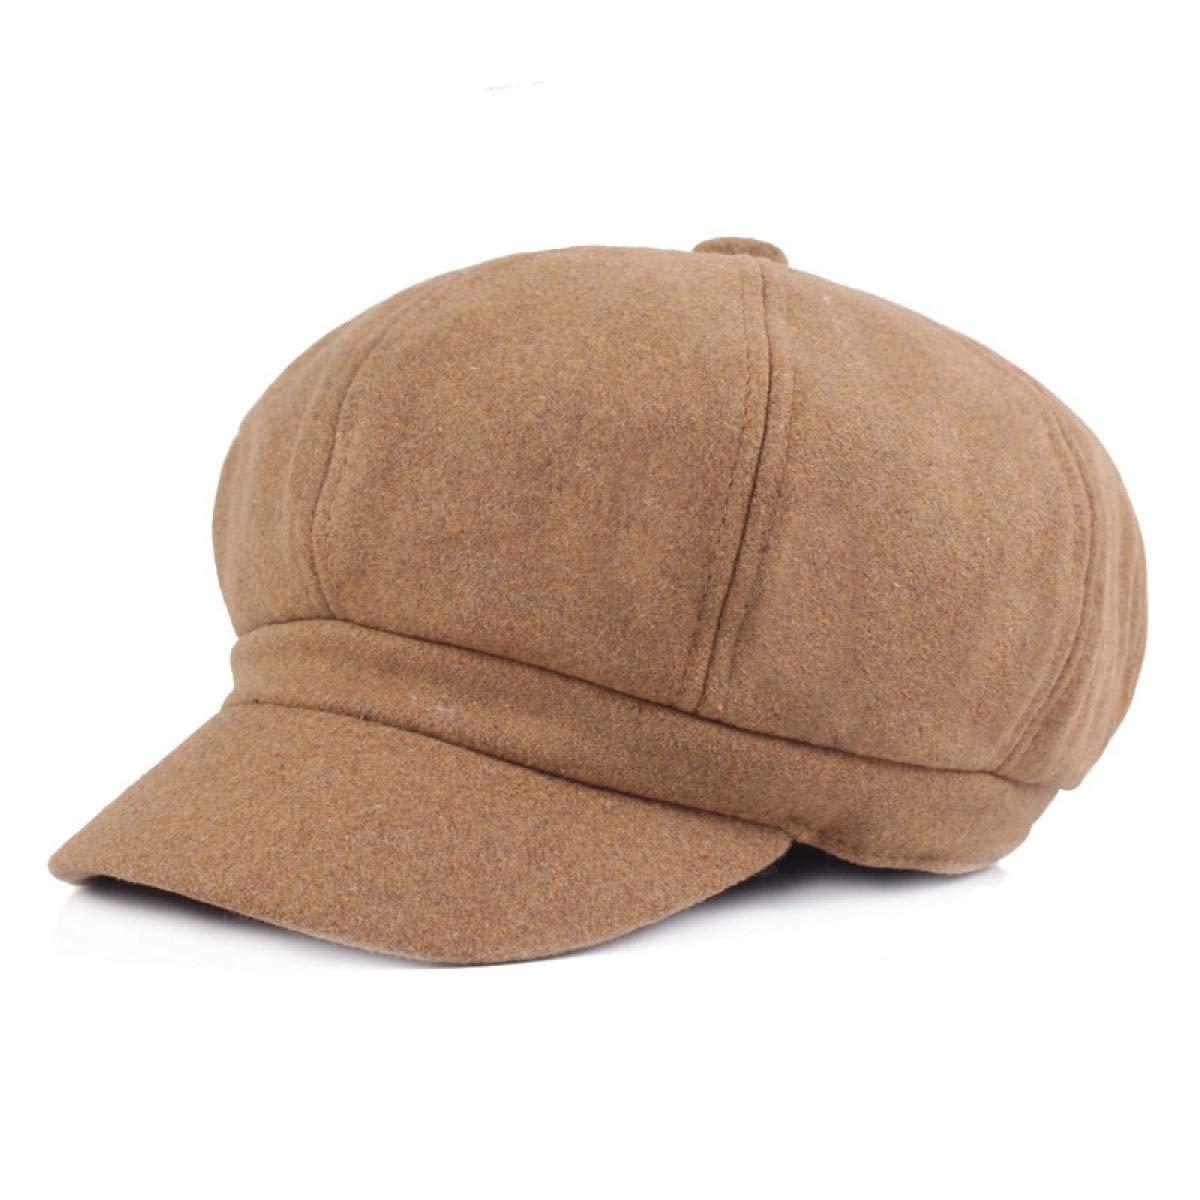 Baker boy Cap Beret Newsboy Cap Winter Spring Black Solid Octagonal Cap Vintage Casual Brand Eight Panel Baker Boy Hat